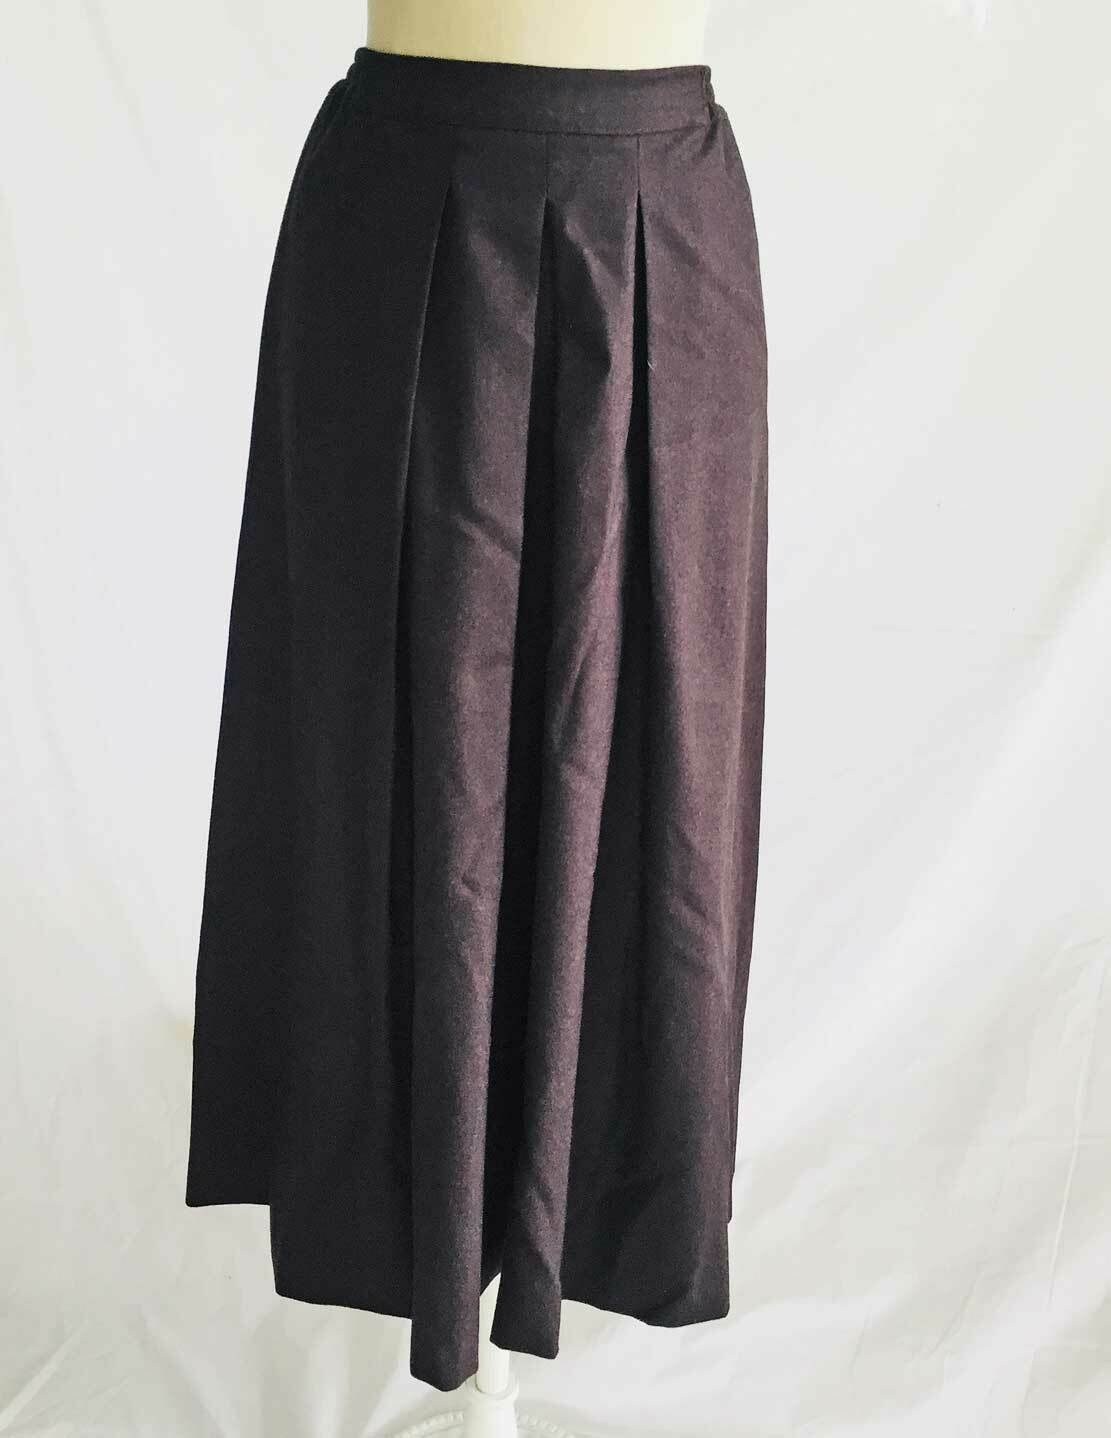 Eskandar Culottes Skirt Dead Stock Split Maxi Midi Wool Cashmere Brown Nos 1